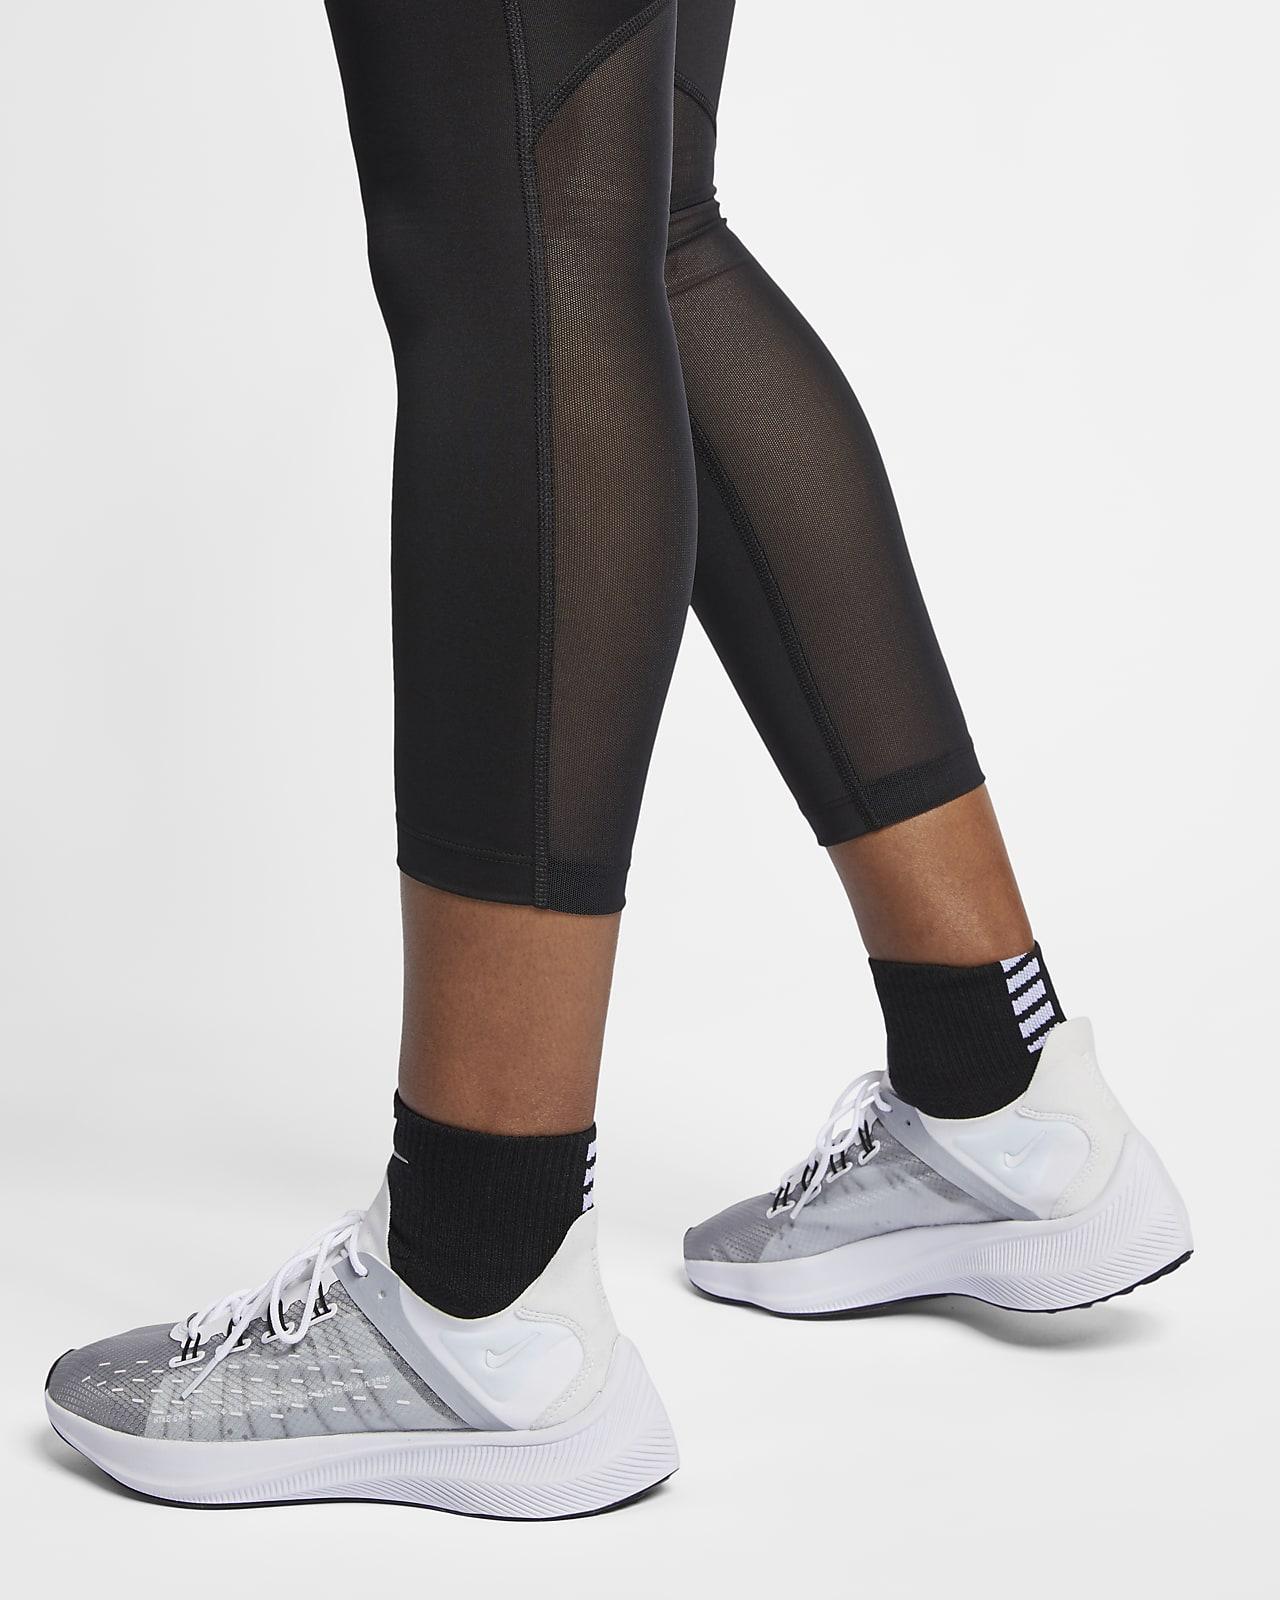 Boquilla Sábana Marco Polo  Nike Fast Mallas de 7/8 de running - Mujer. Nike ES